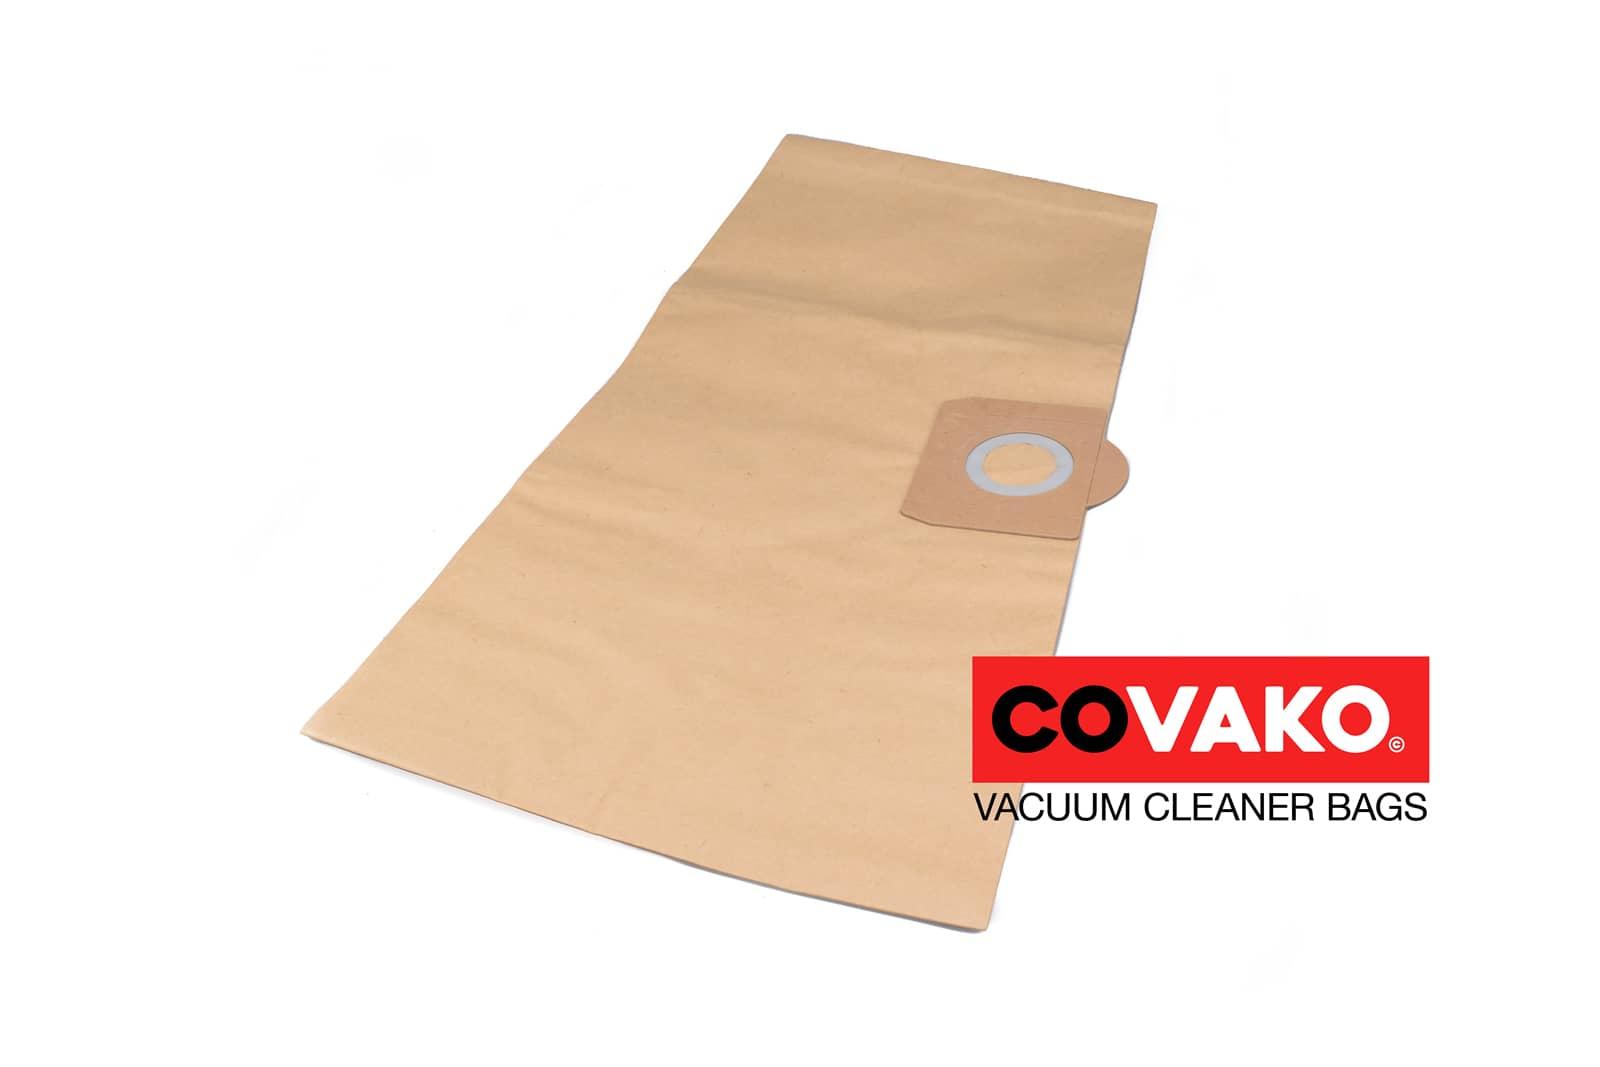 Hako Supervac L 1-30 / Papier - Hako sacs d'aspirateur